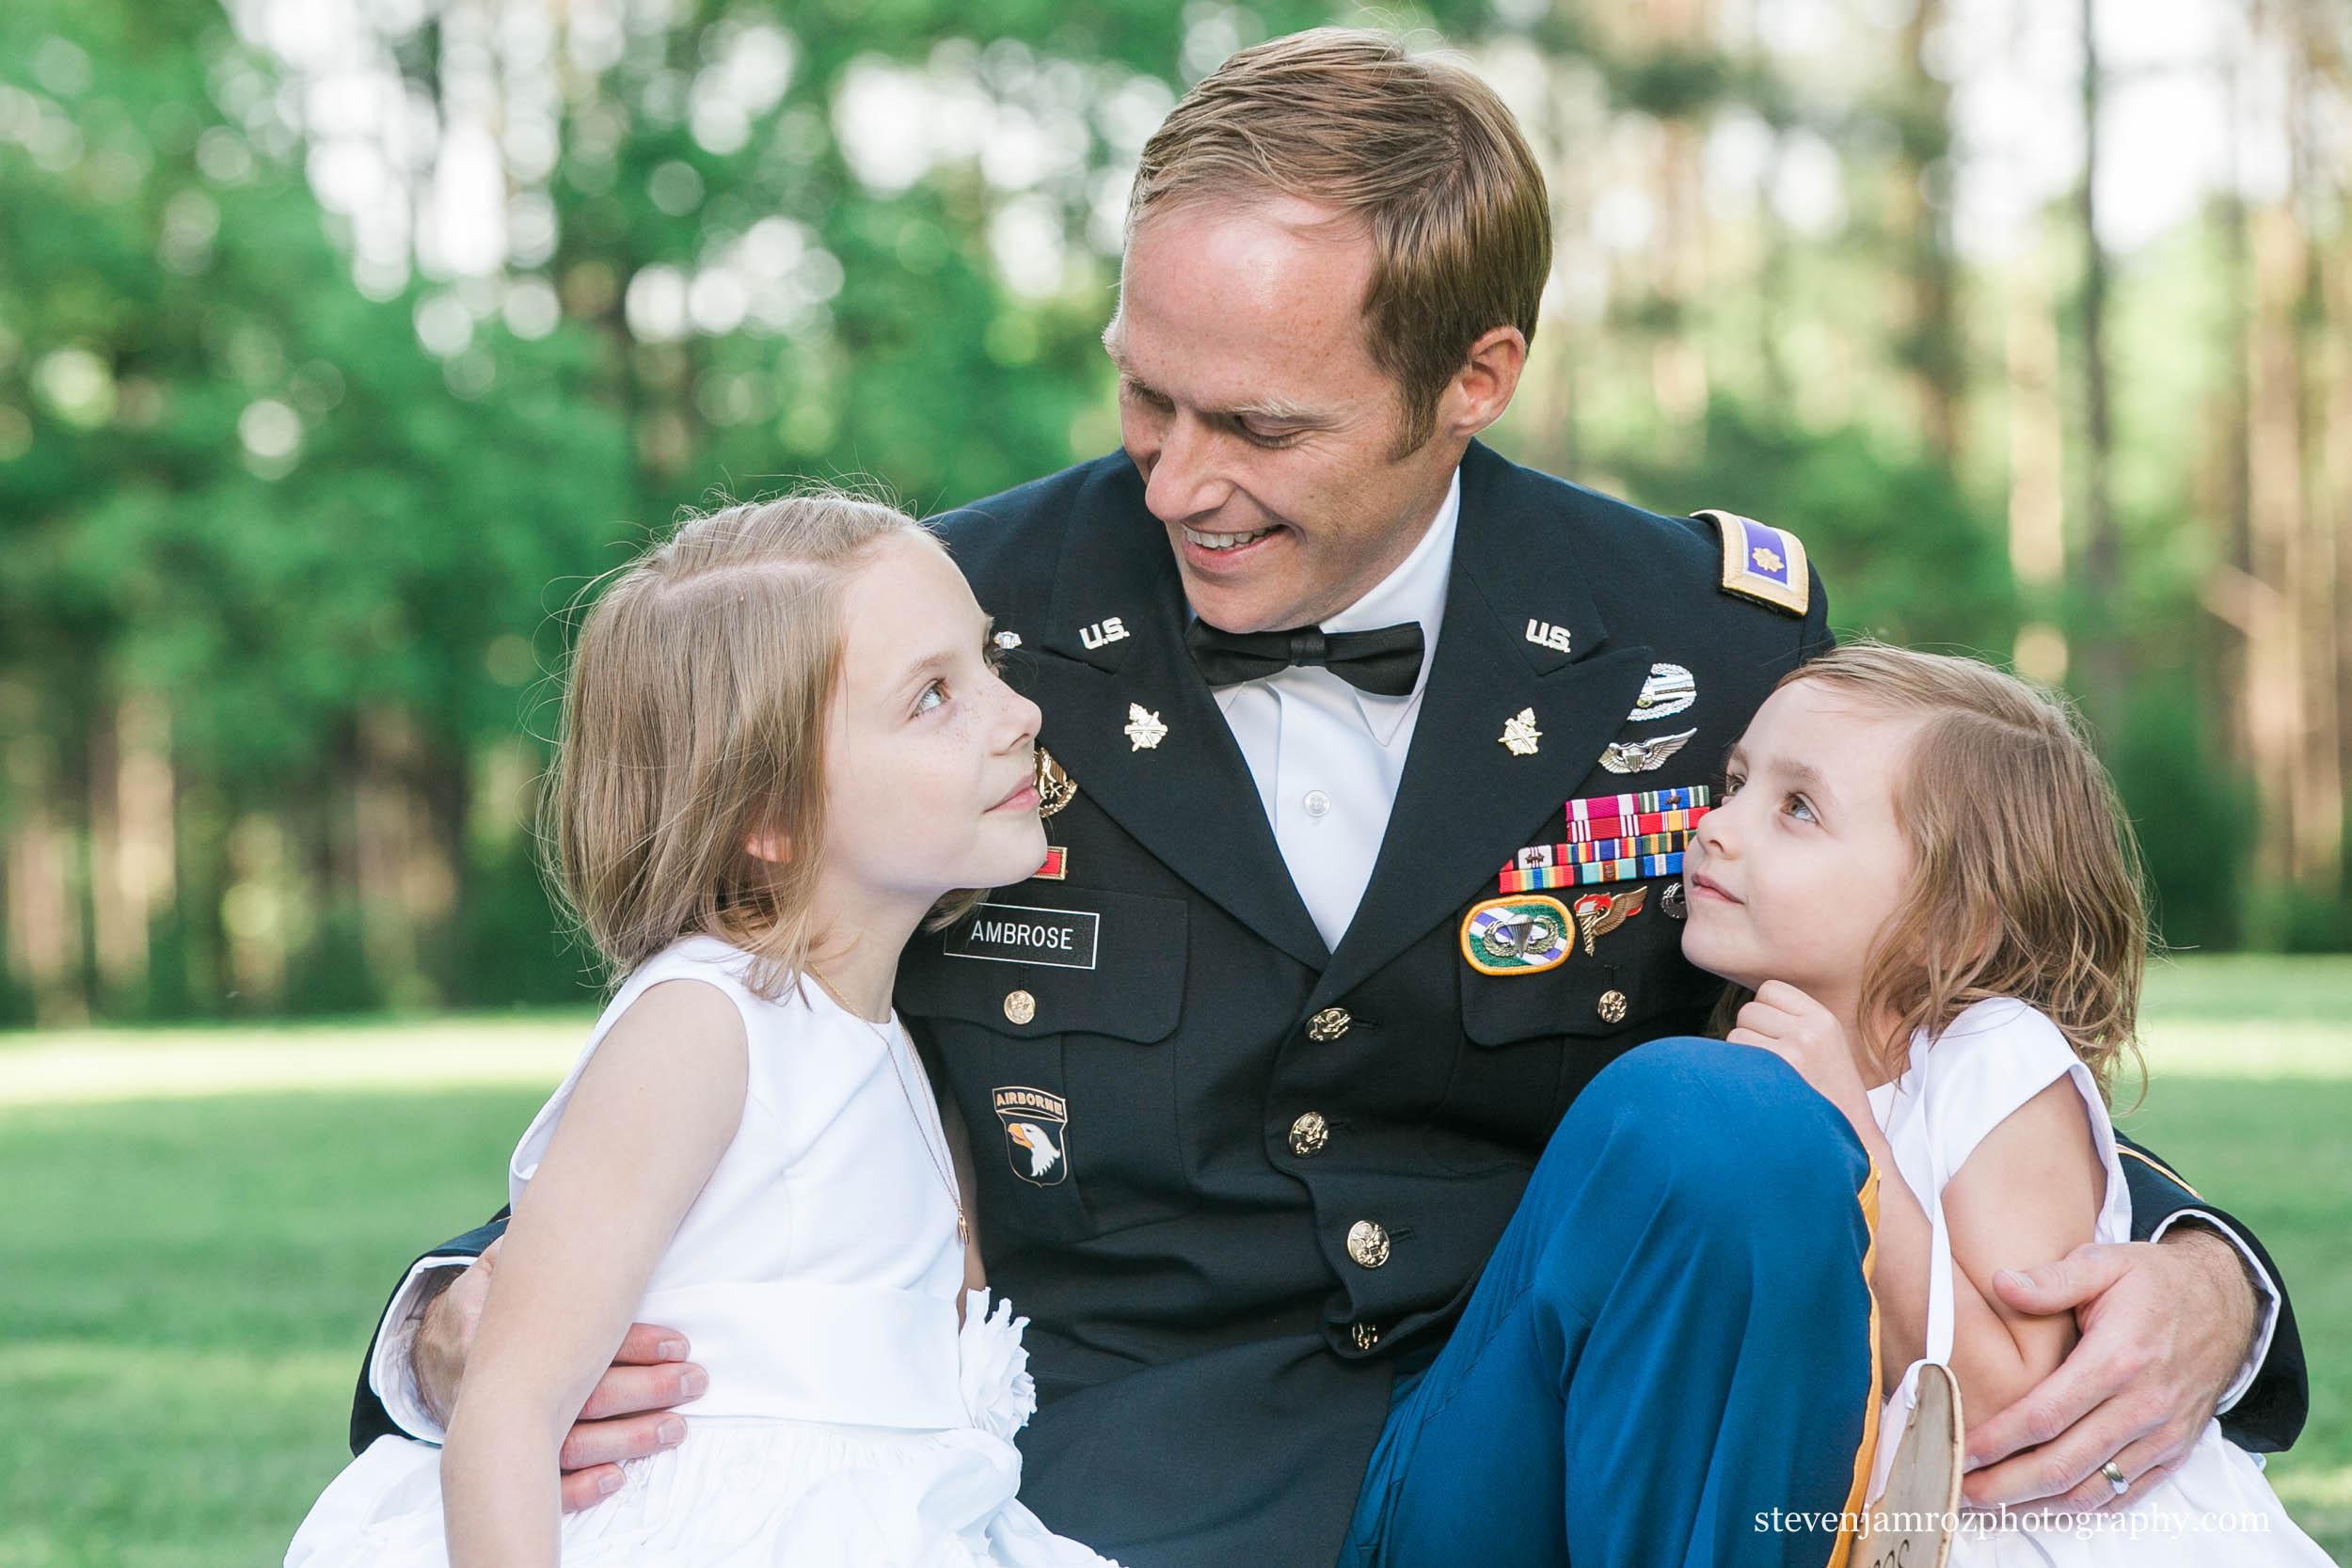 raleigh-military-wedding-photography-0827.jpg